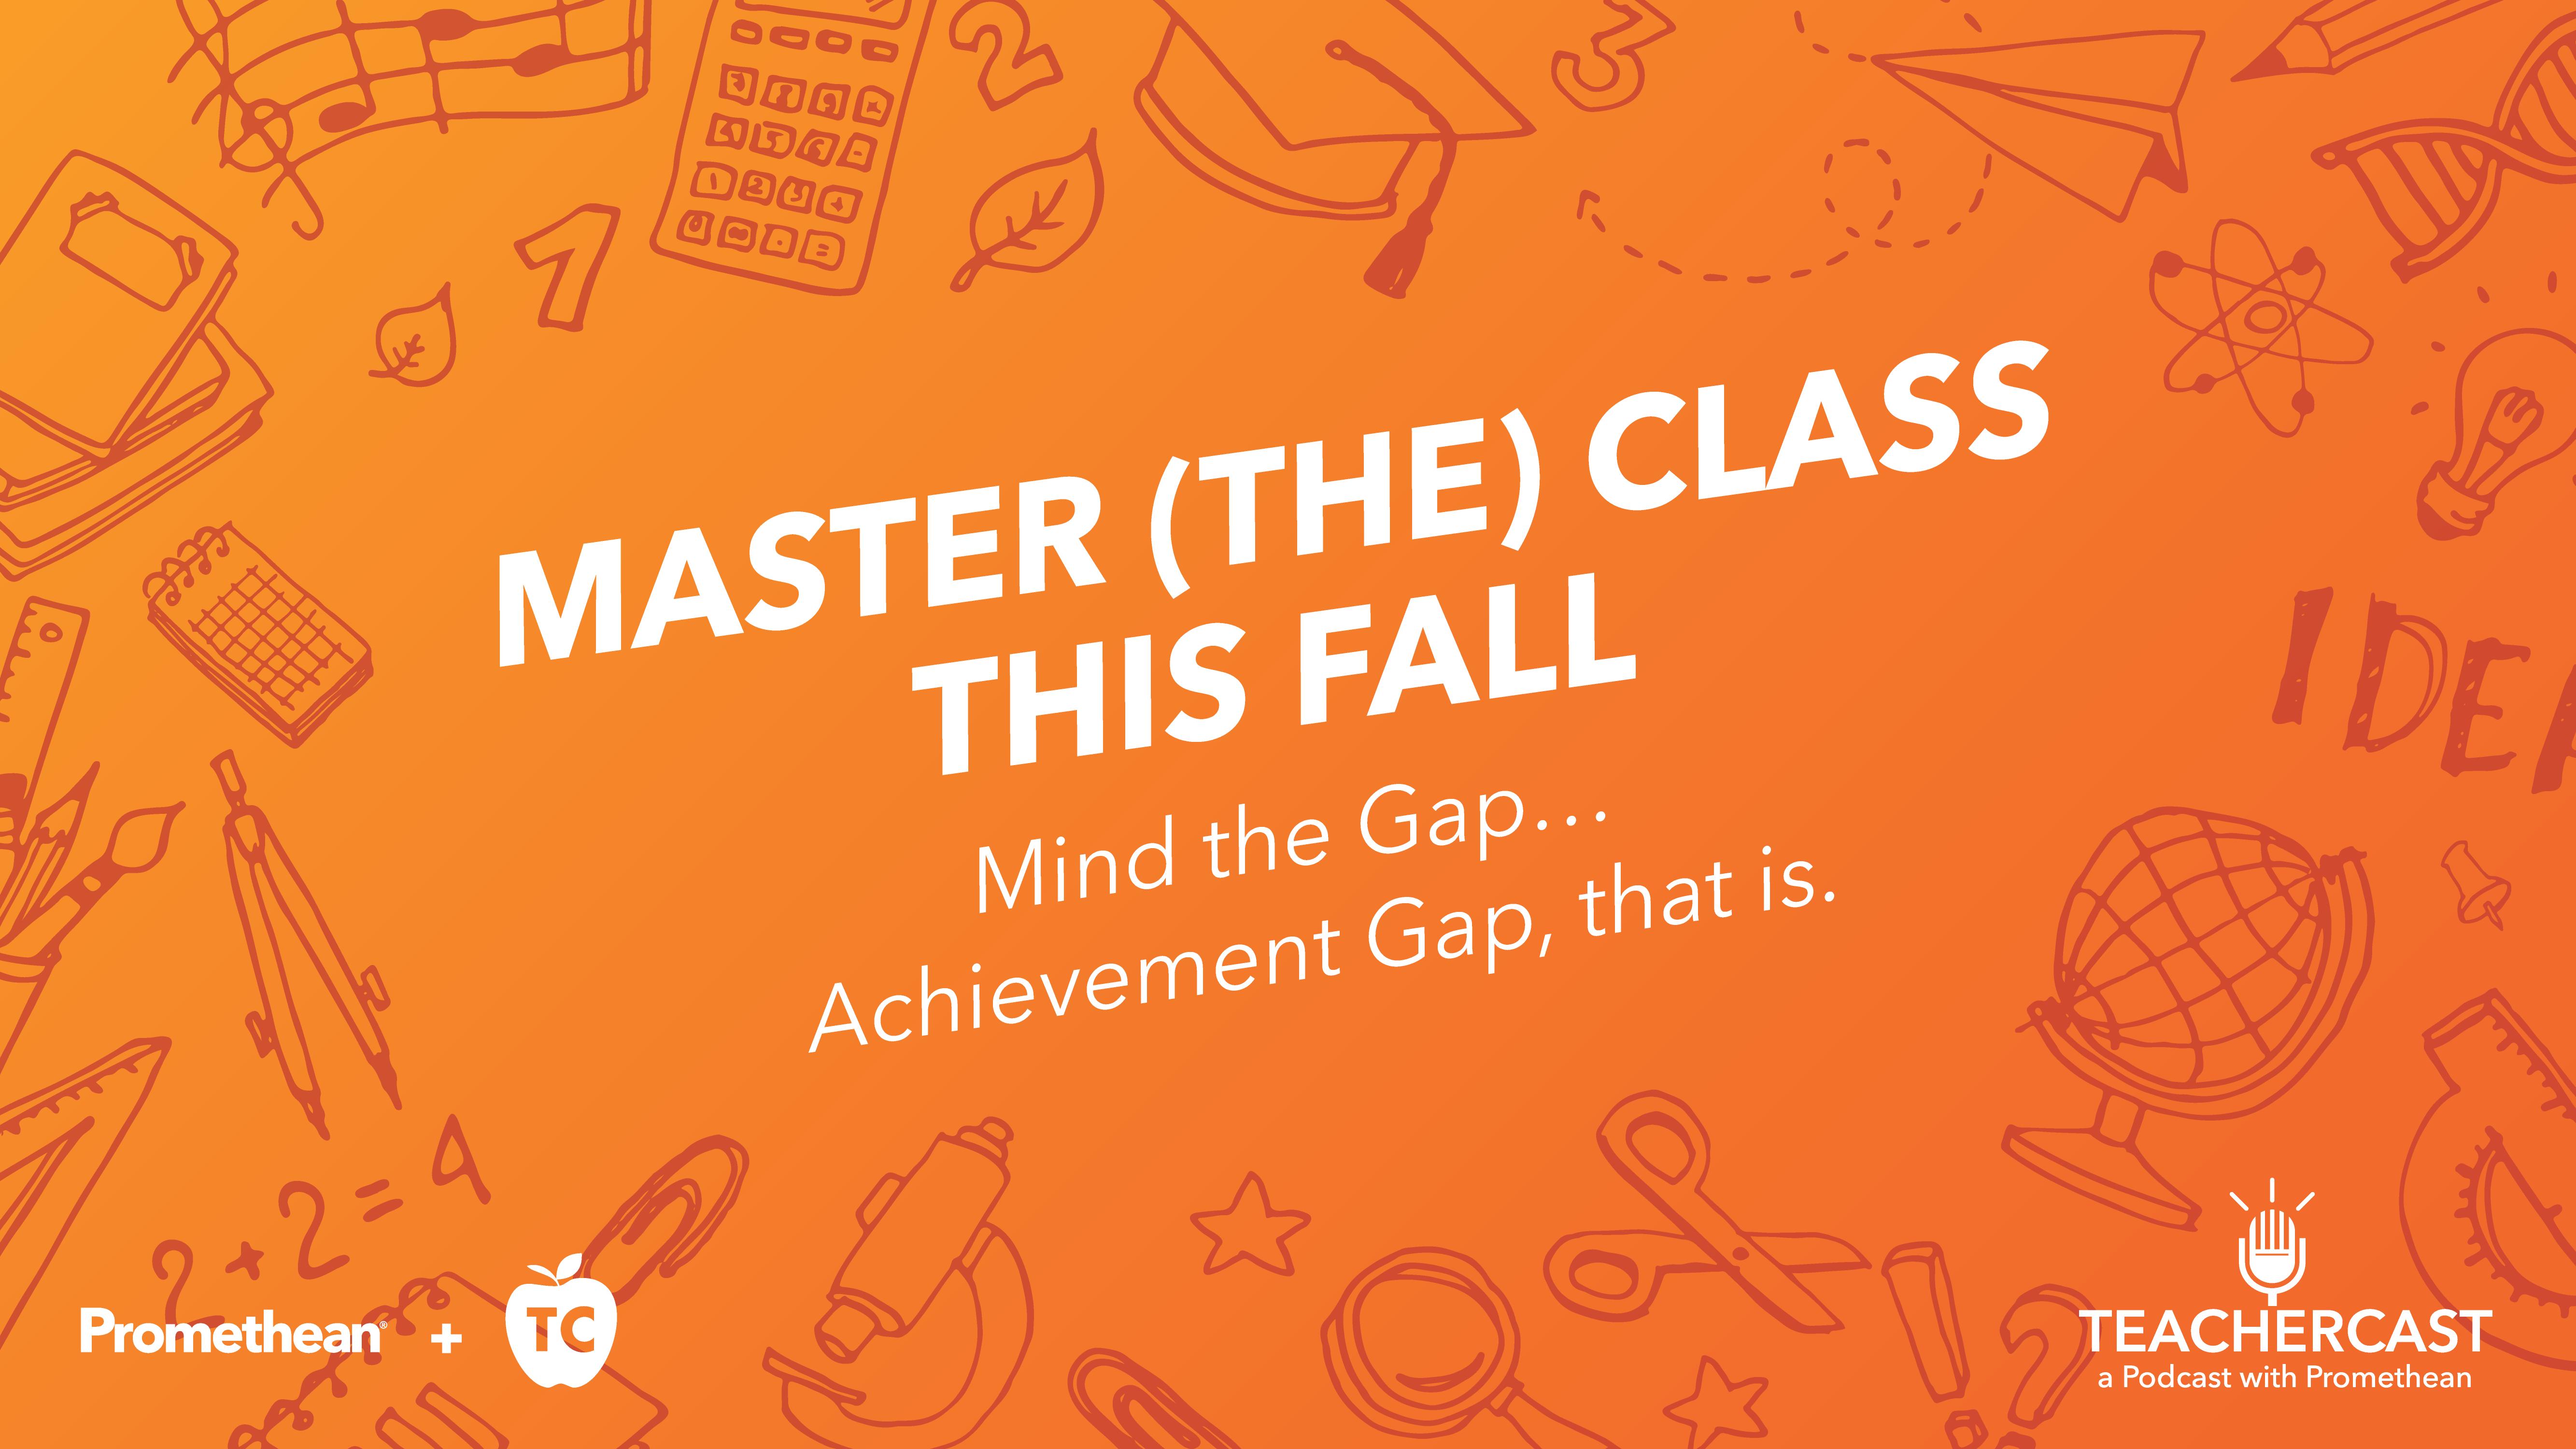 Mind the Gap ... The Achievement Gap!